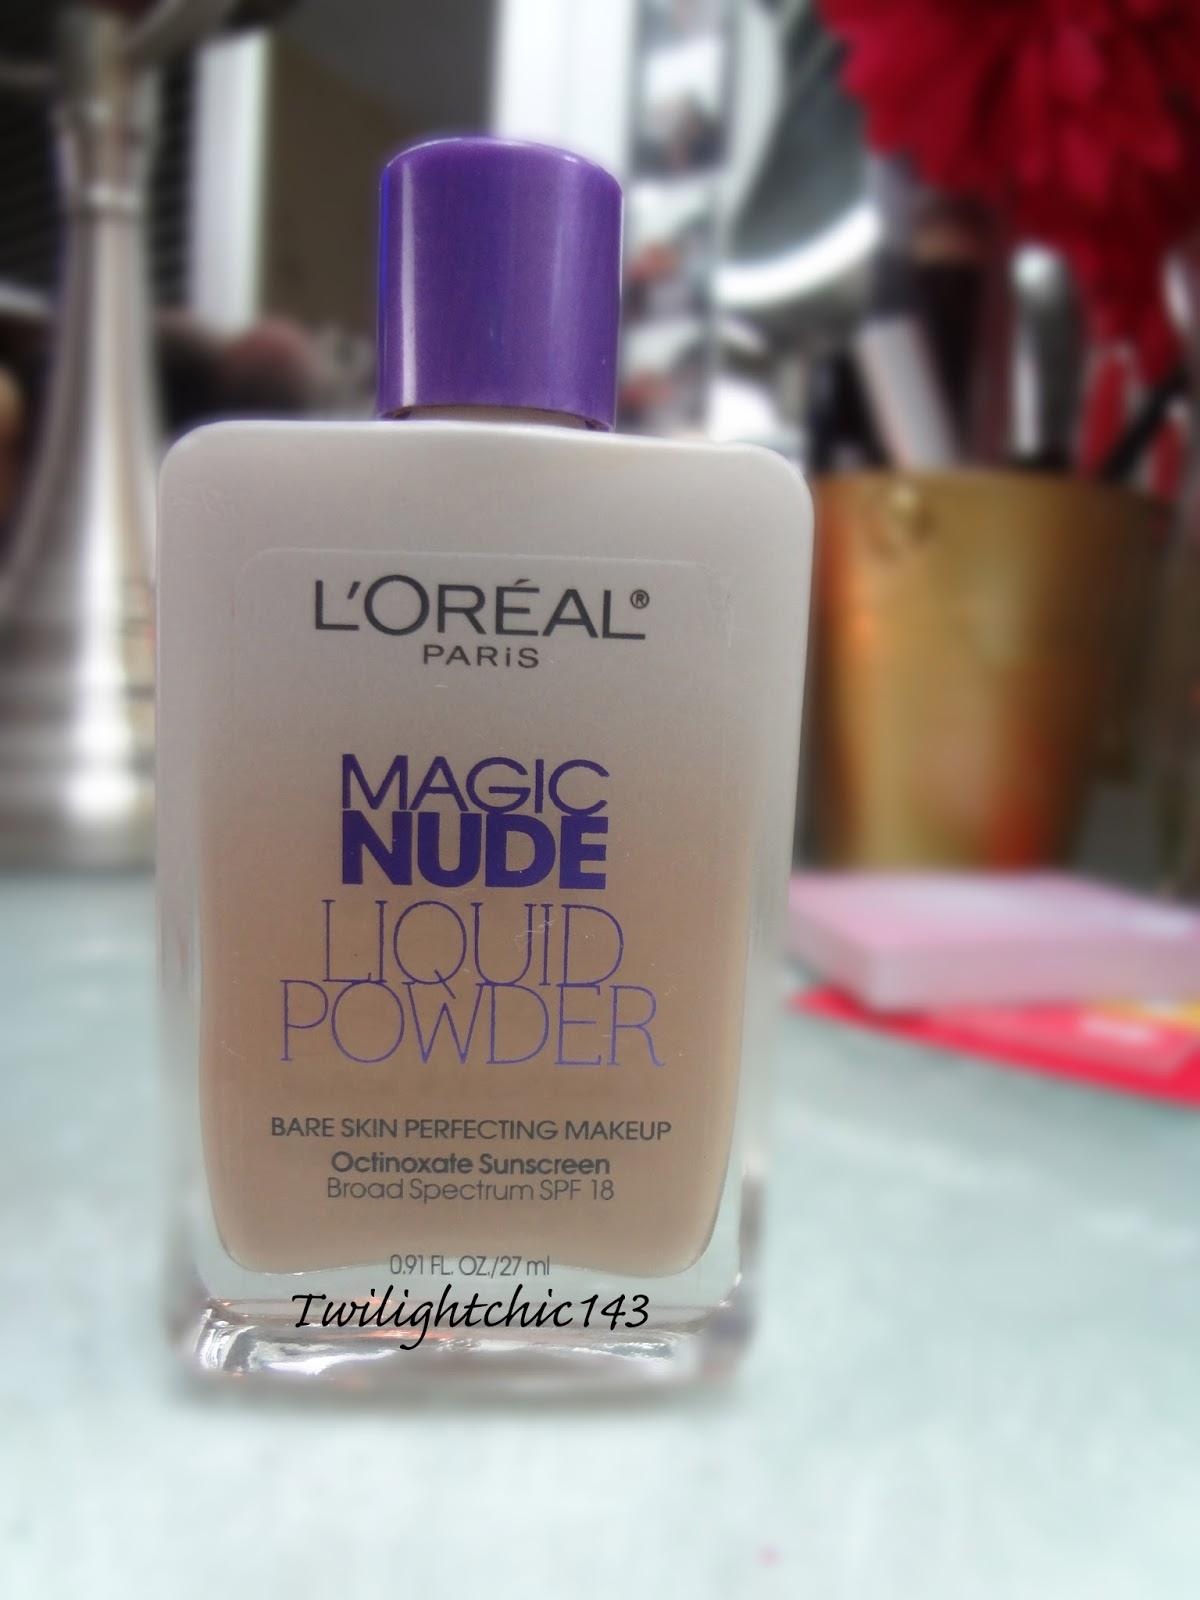 Loreal Magic Nude Liquid Powder - Daily Diary By Gabriela